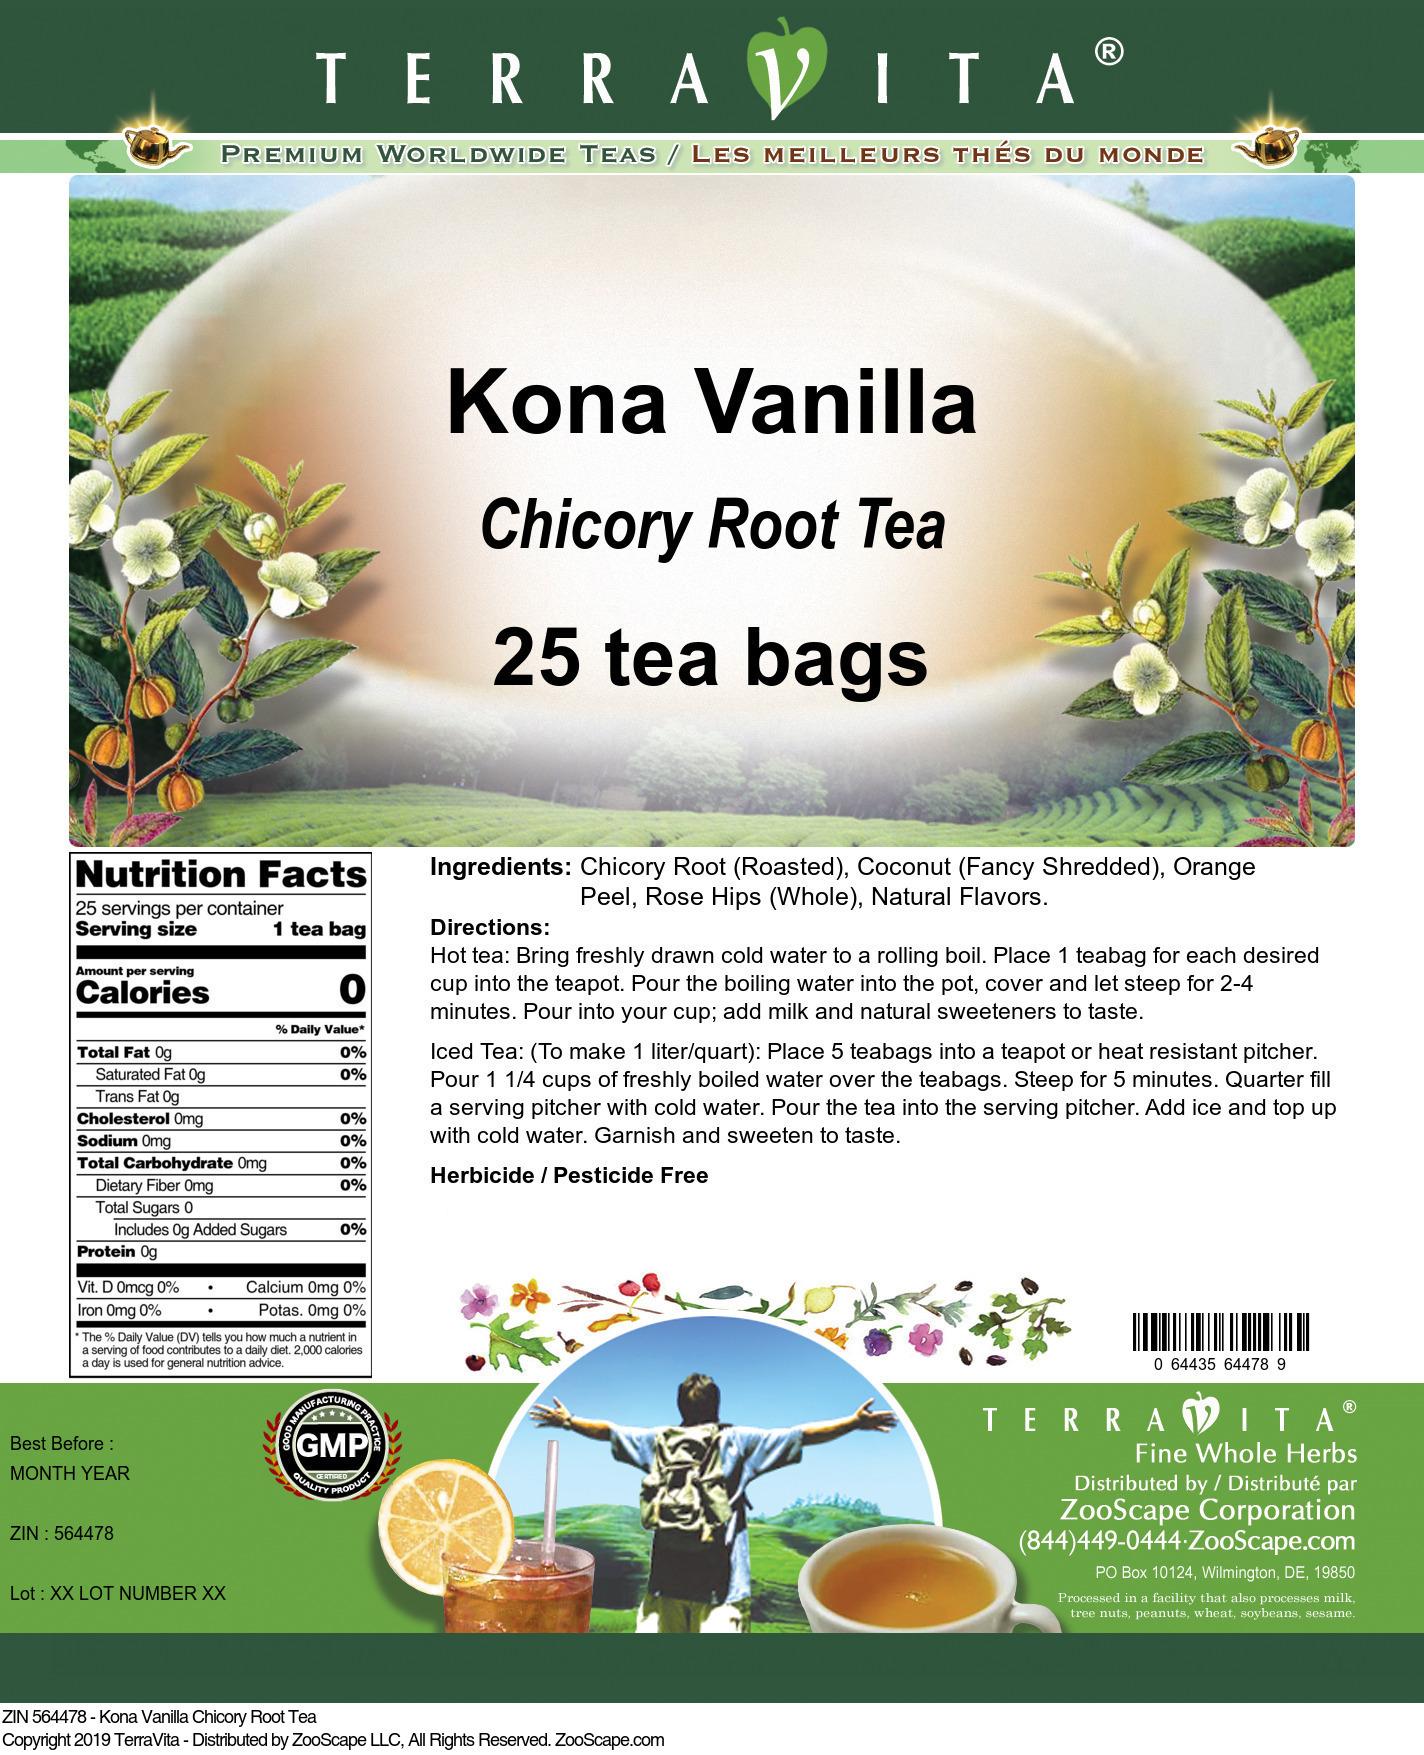 Kona Vanilla Chicory Root Tea